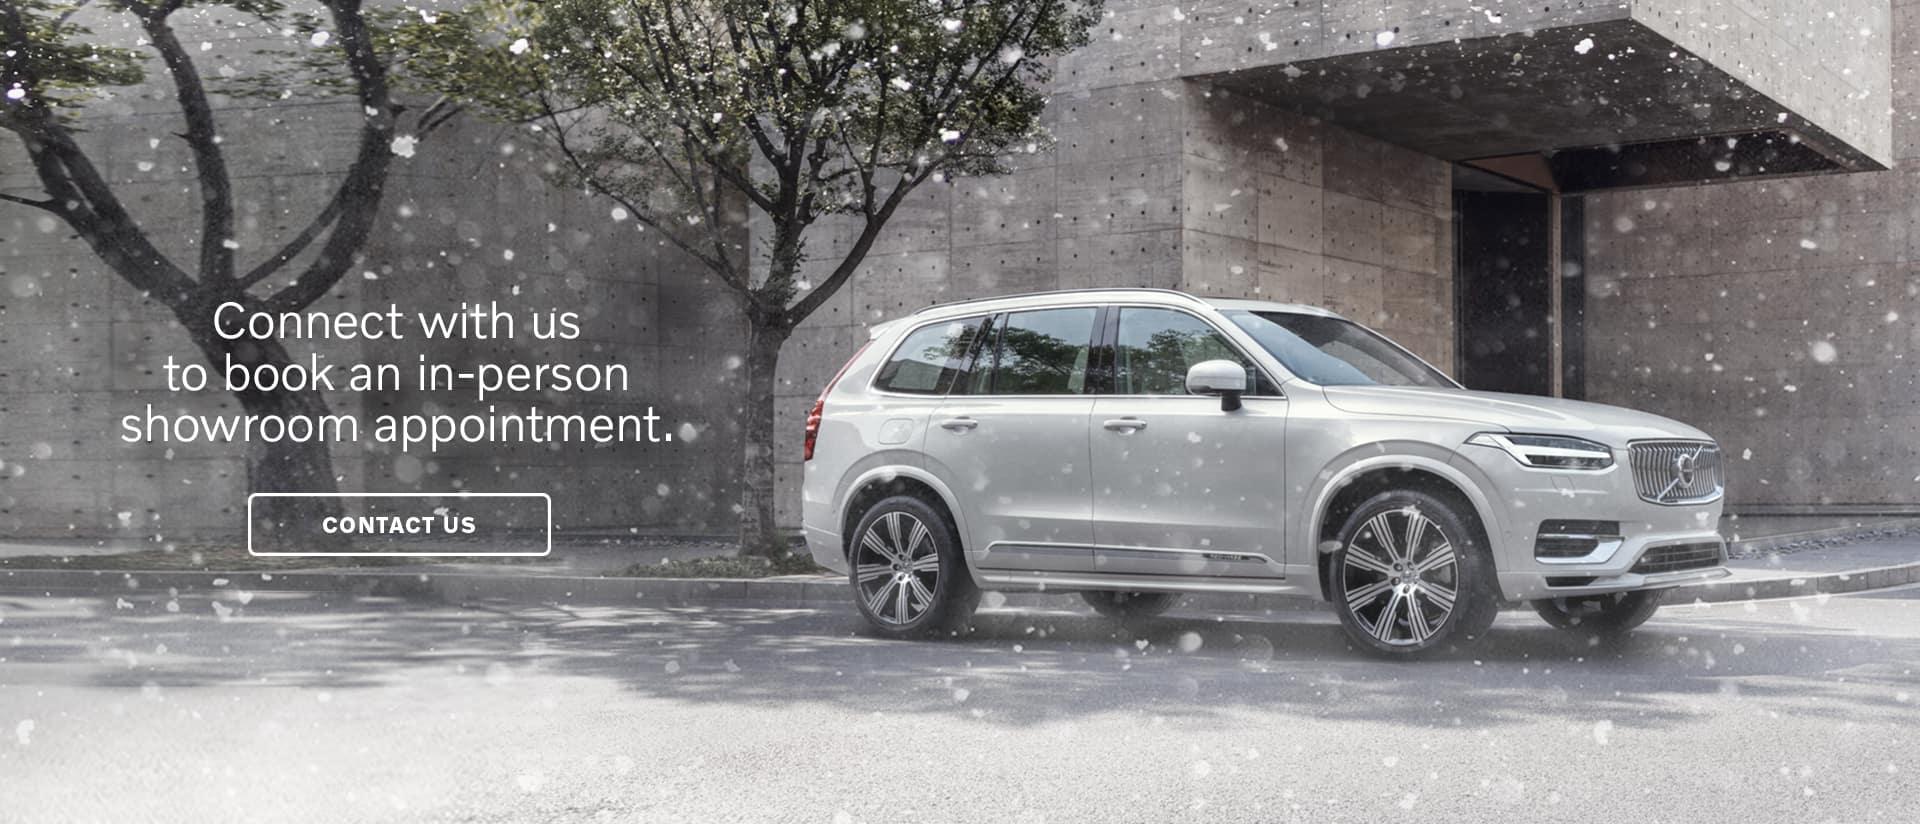 2019 Volvo S60 Tan